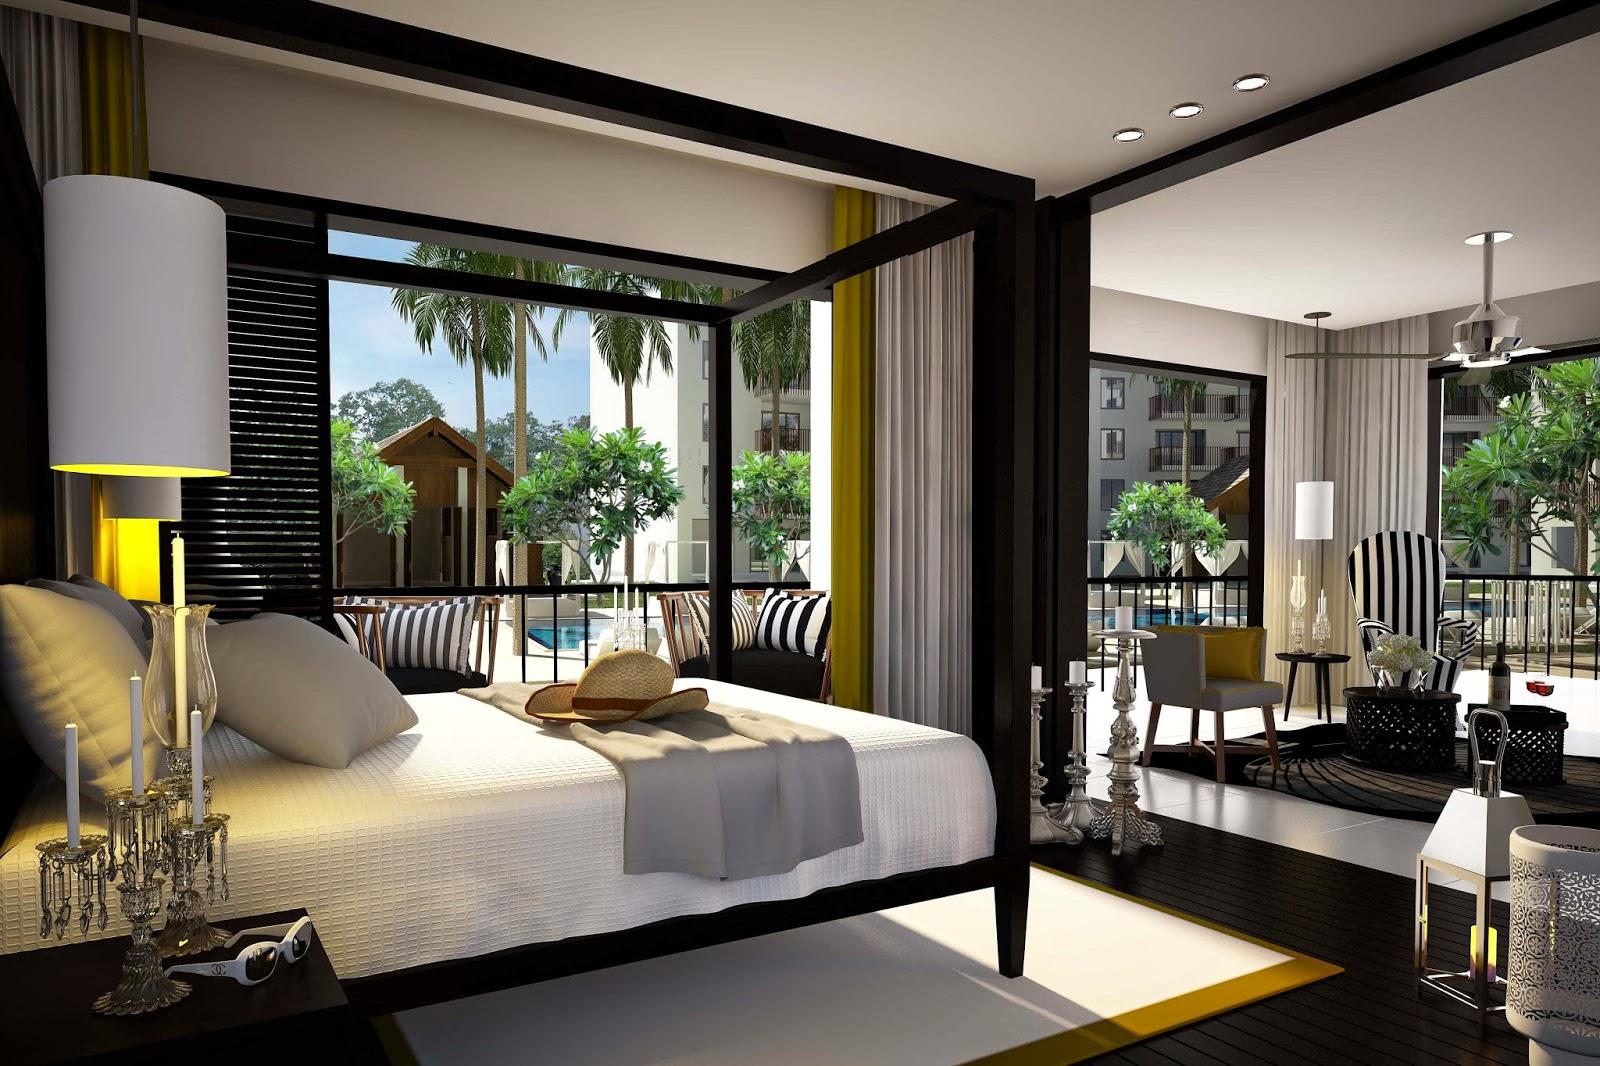 Interior Design Styles for Modern Bedroom